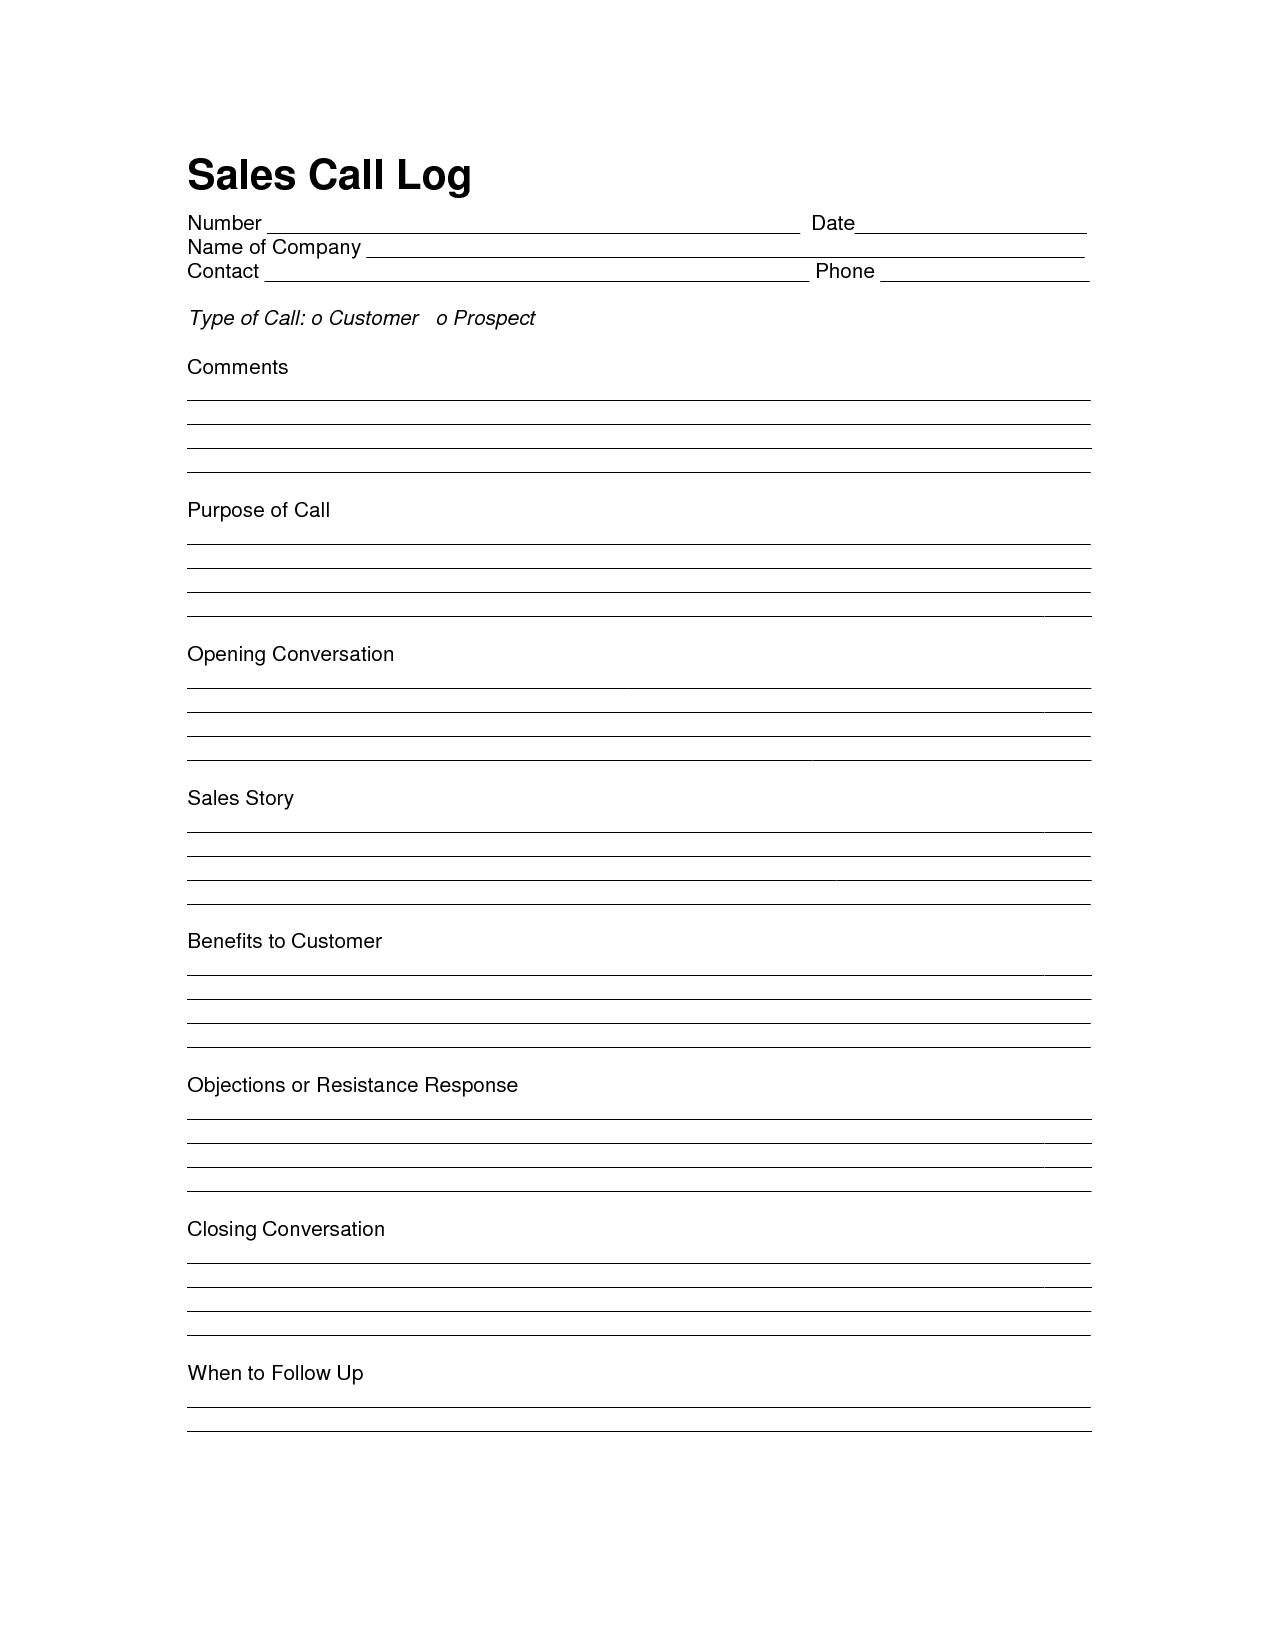 Sales Log Sheet Template | Sales Call Log Template | Call With Sales Call Report Template Free